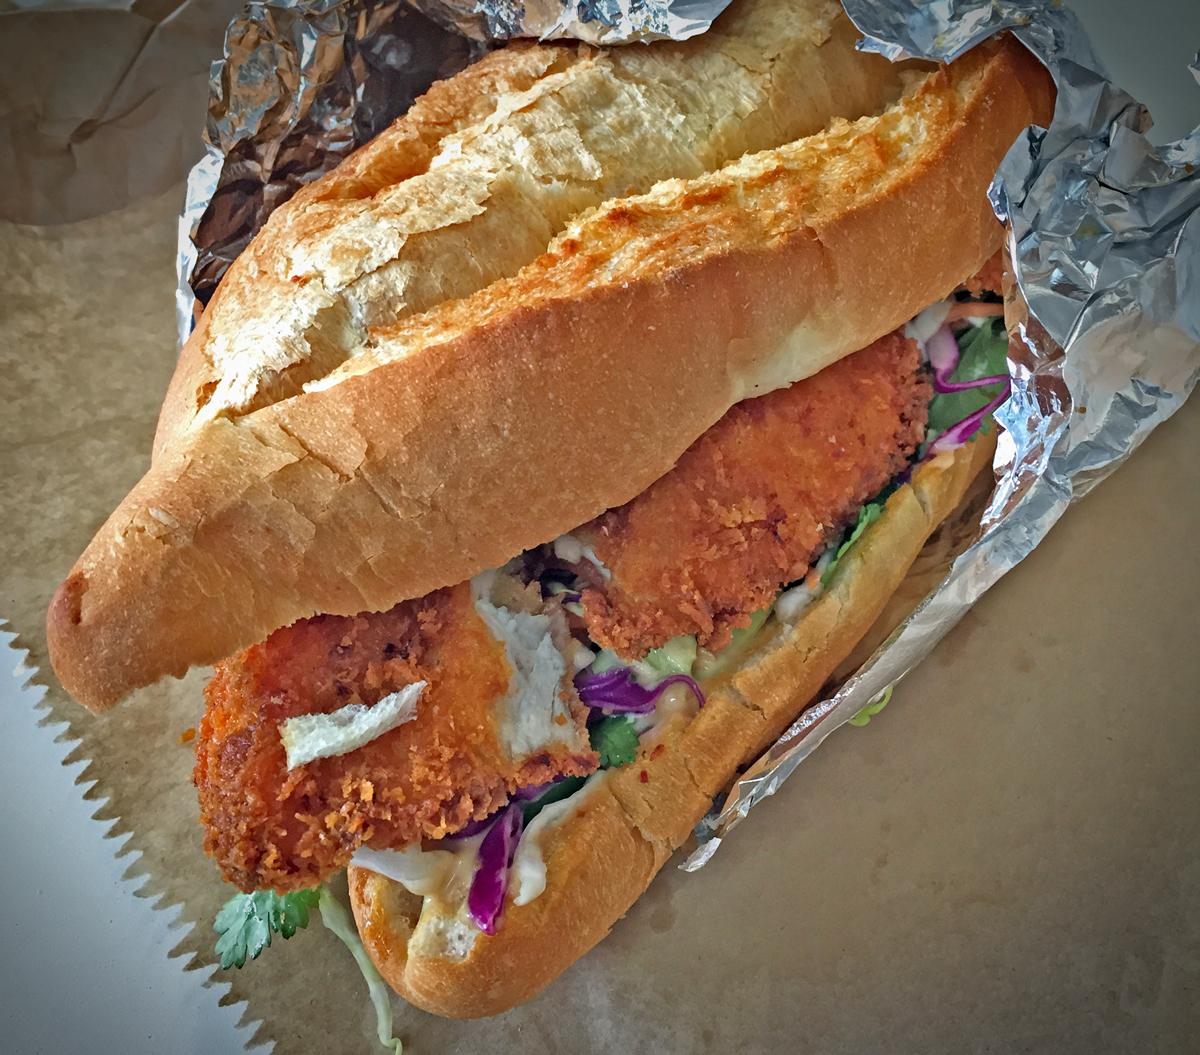 City Edge Review, Chicken Burger Review Food Critic HolyCluck Holy Cluck Sandwich Chook Eran Thomson